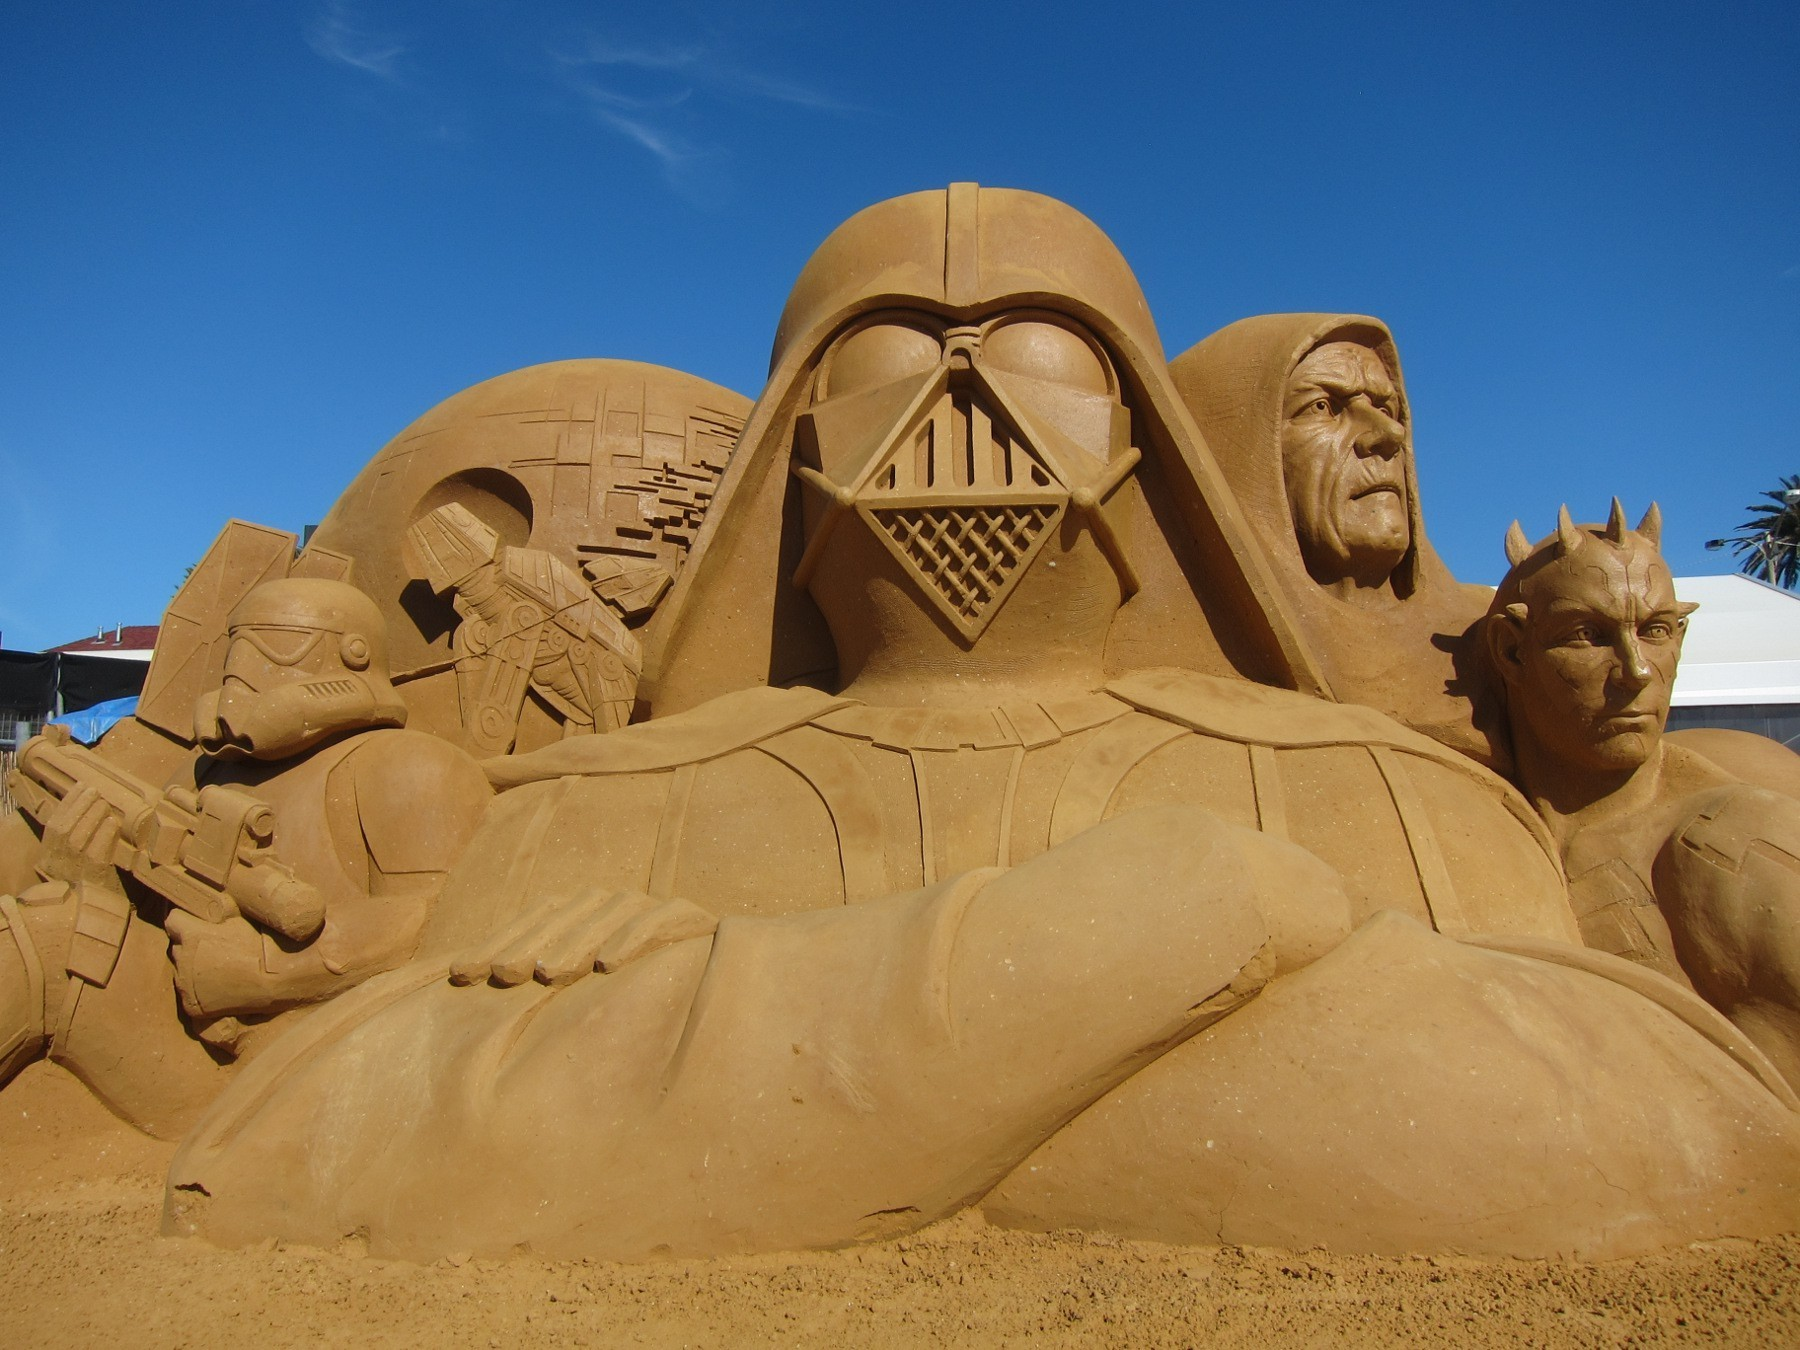 fantastische-realistische-Sandskulpturen-Star-Wars-Thema